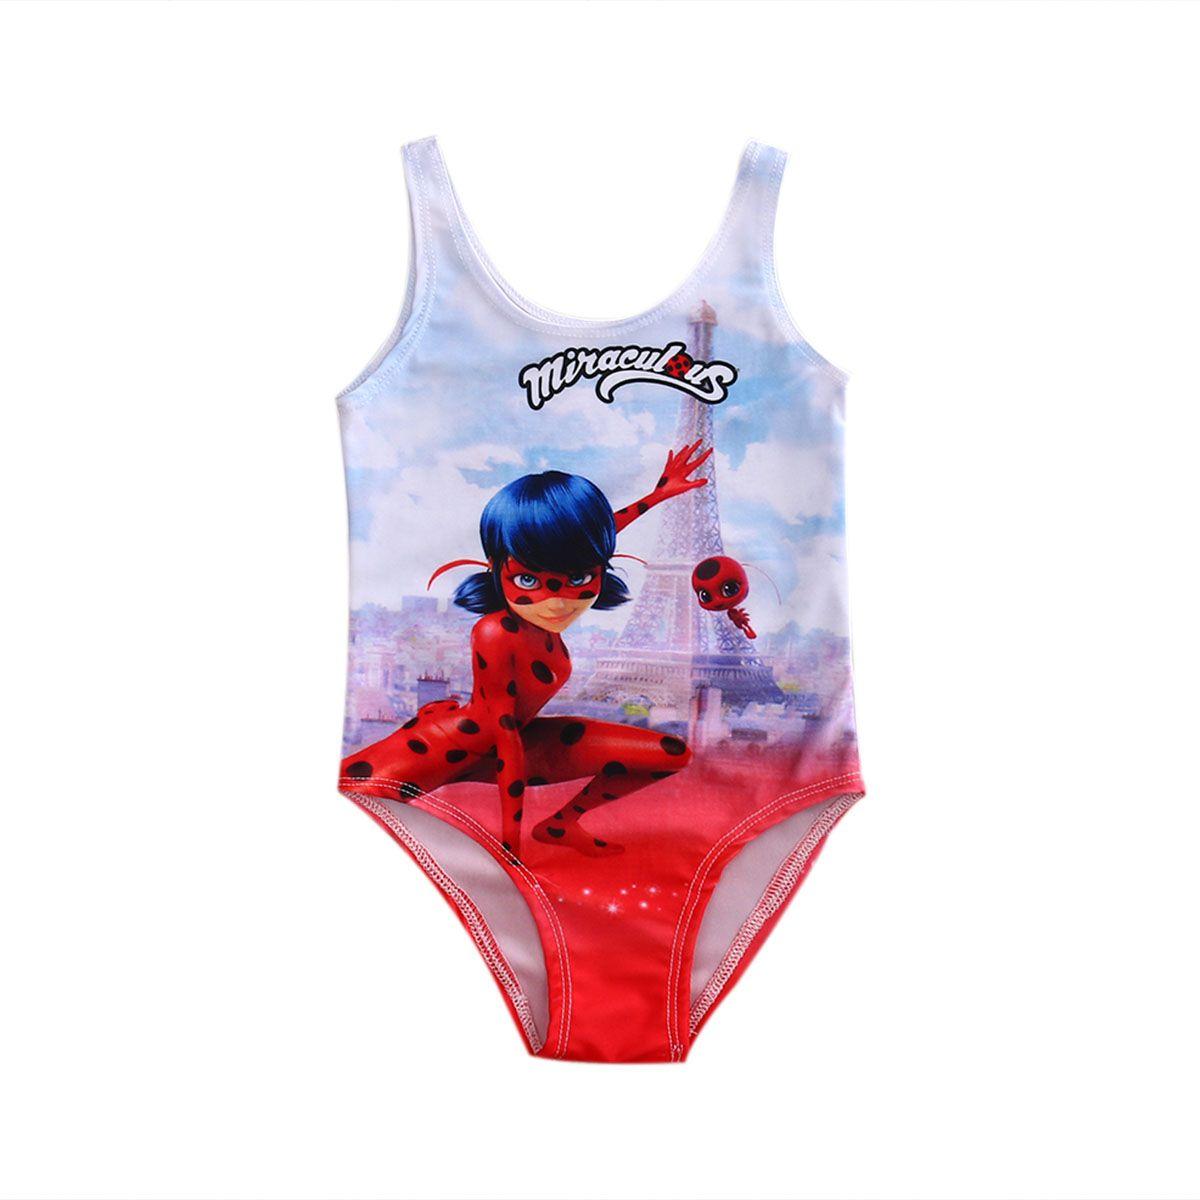 06416b7aaebf Wholesale- 2017 New Cute Character Baby Girls Children One Piece ...